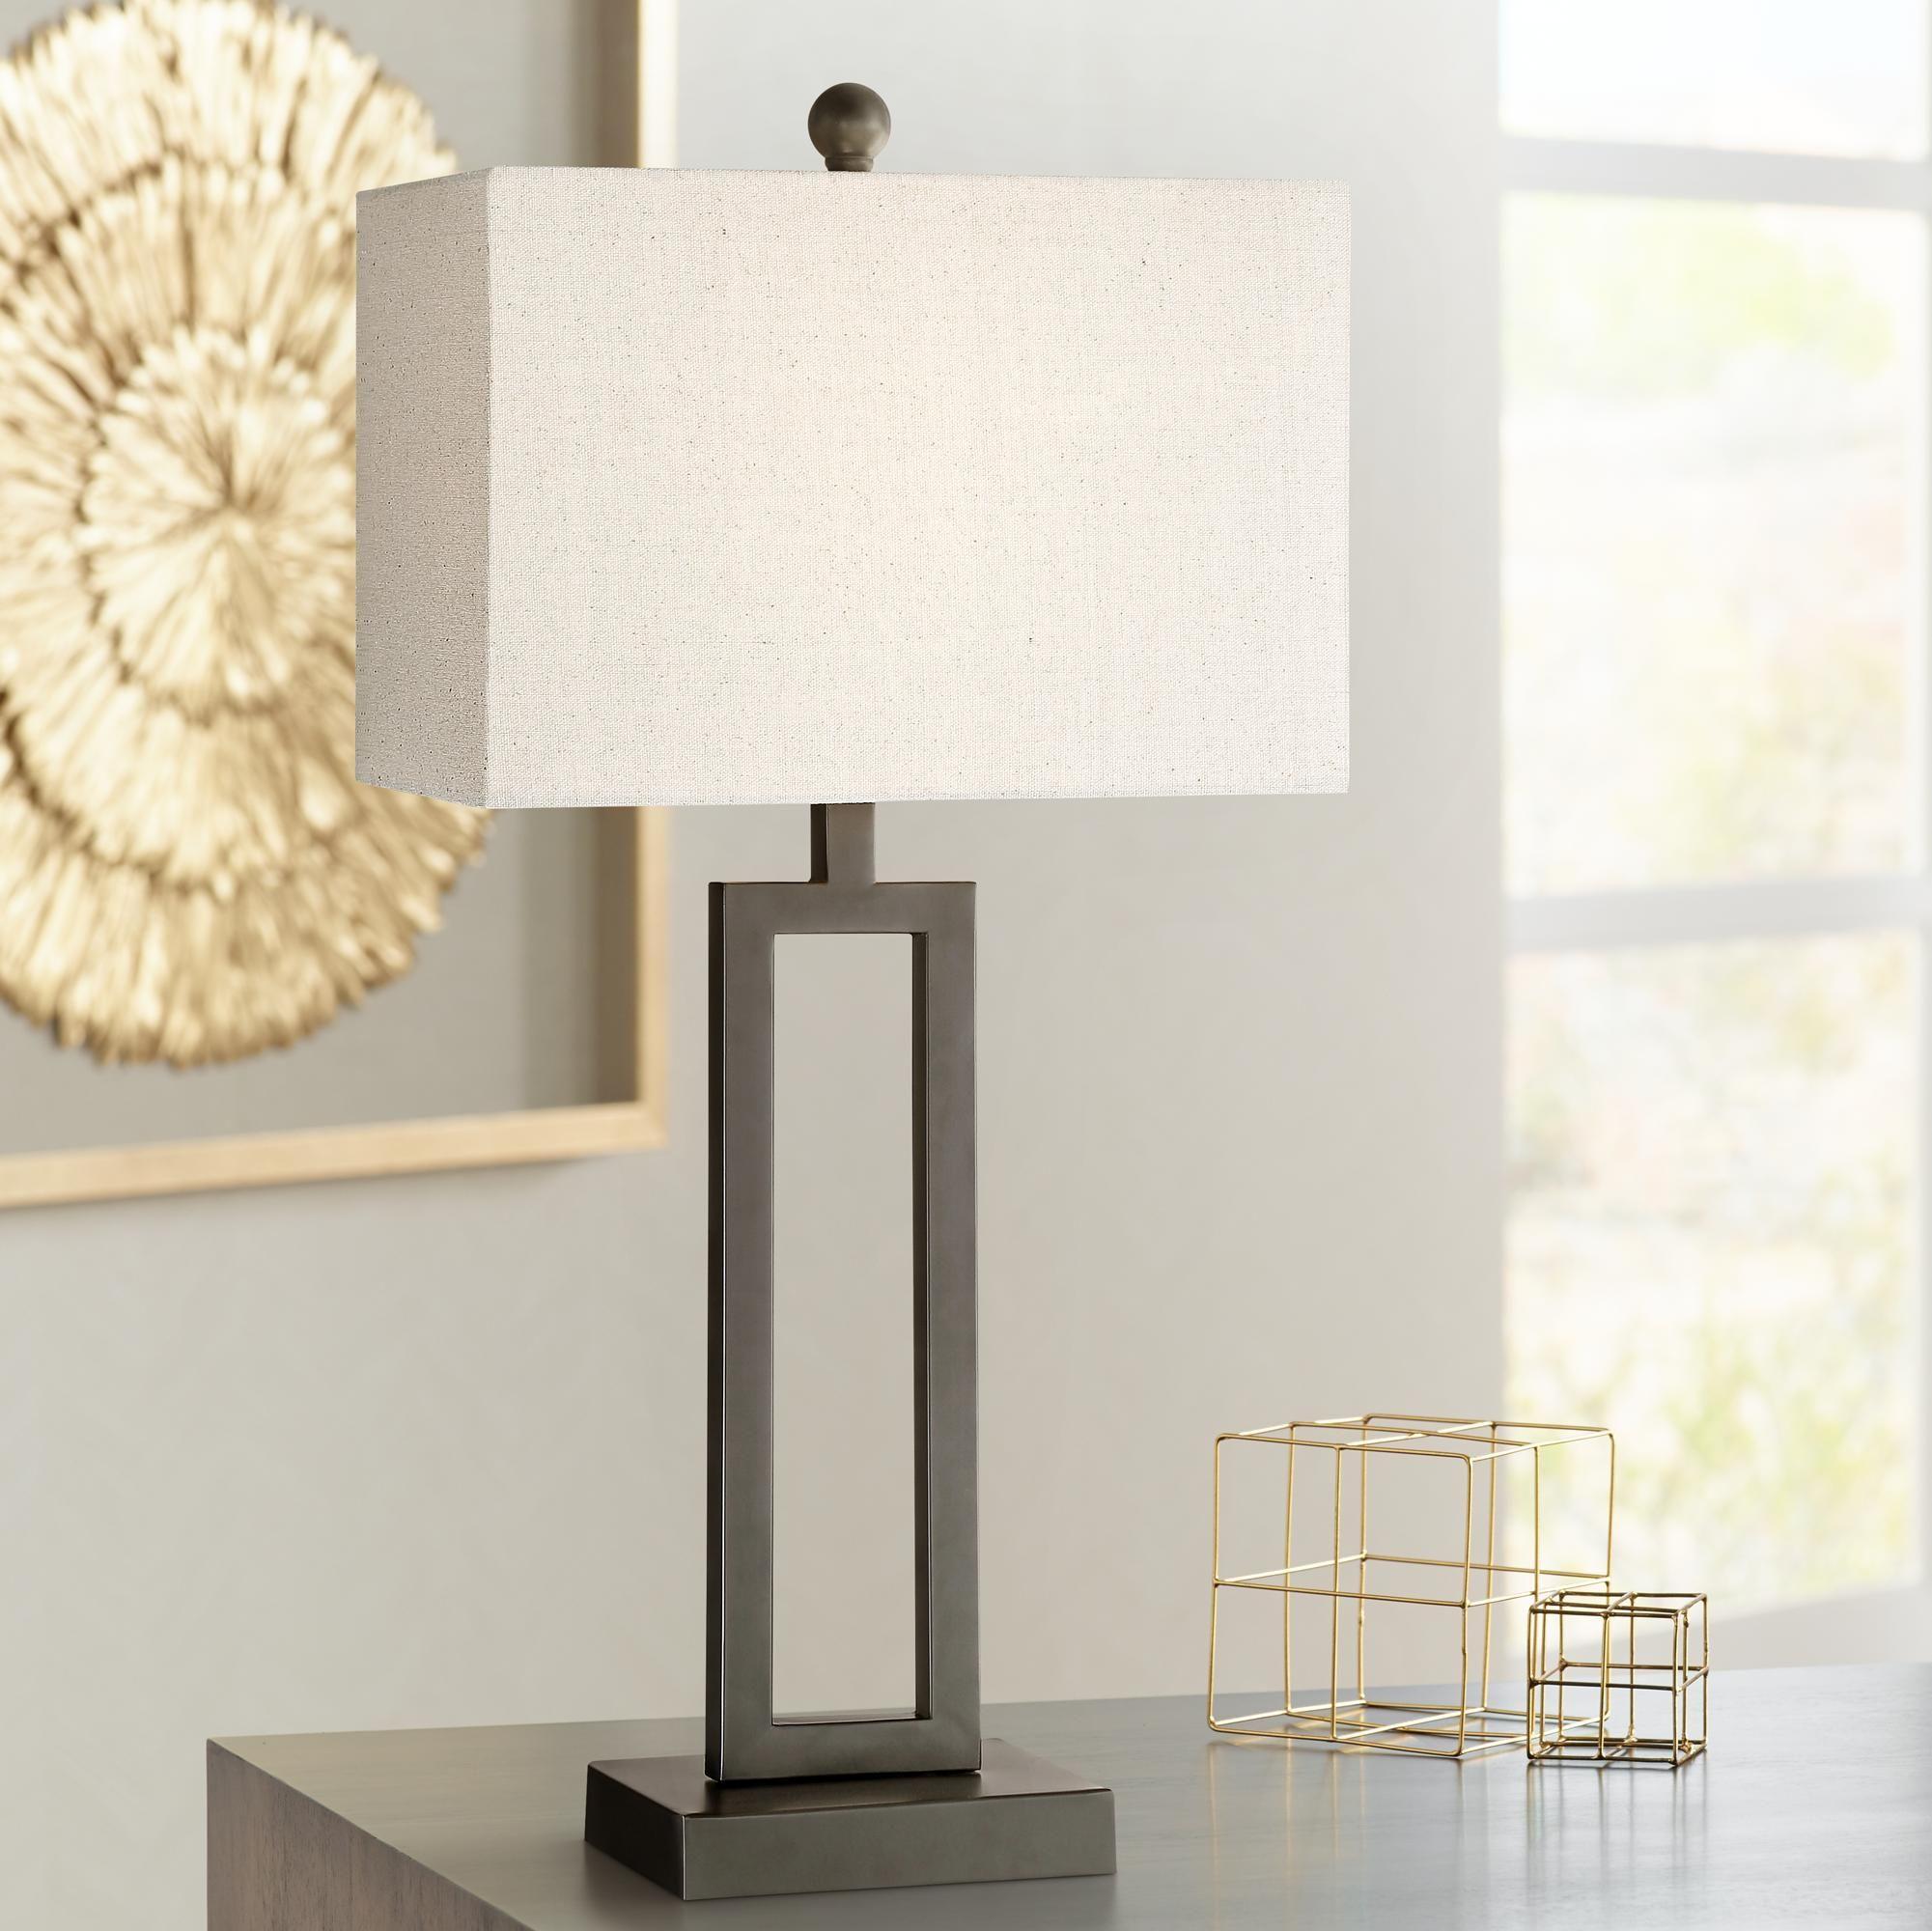 Table Lamps Aston Black Modern Table Lamp Black Table Lamps Table Lamps Living Room Modern Table Lamp